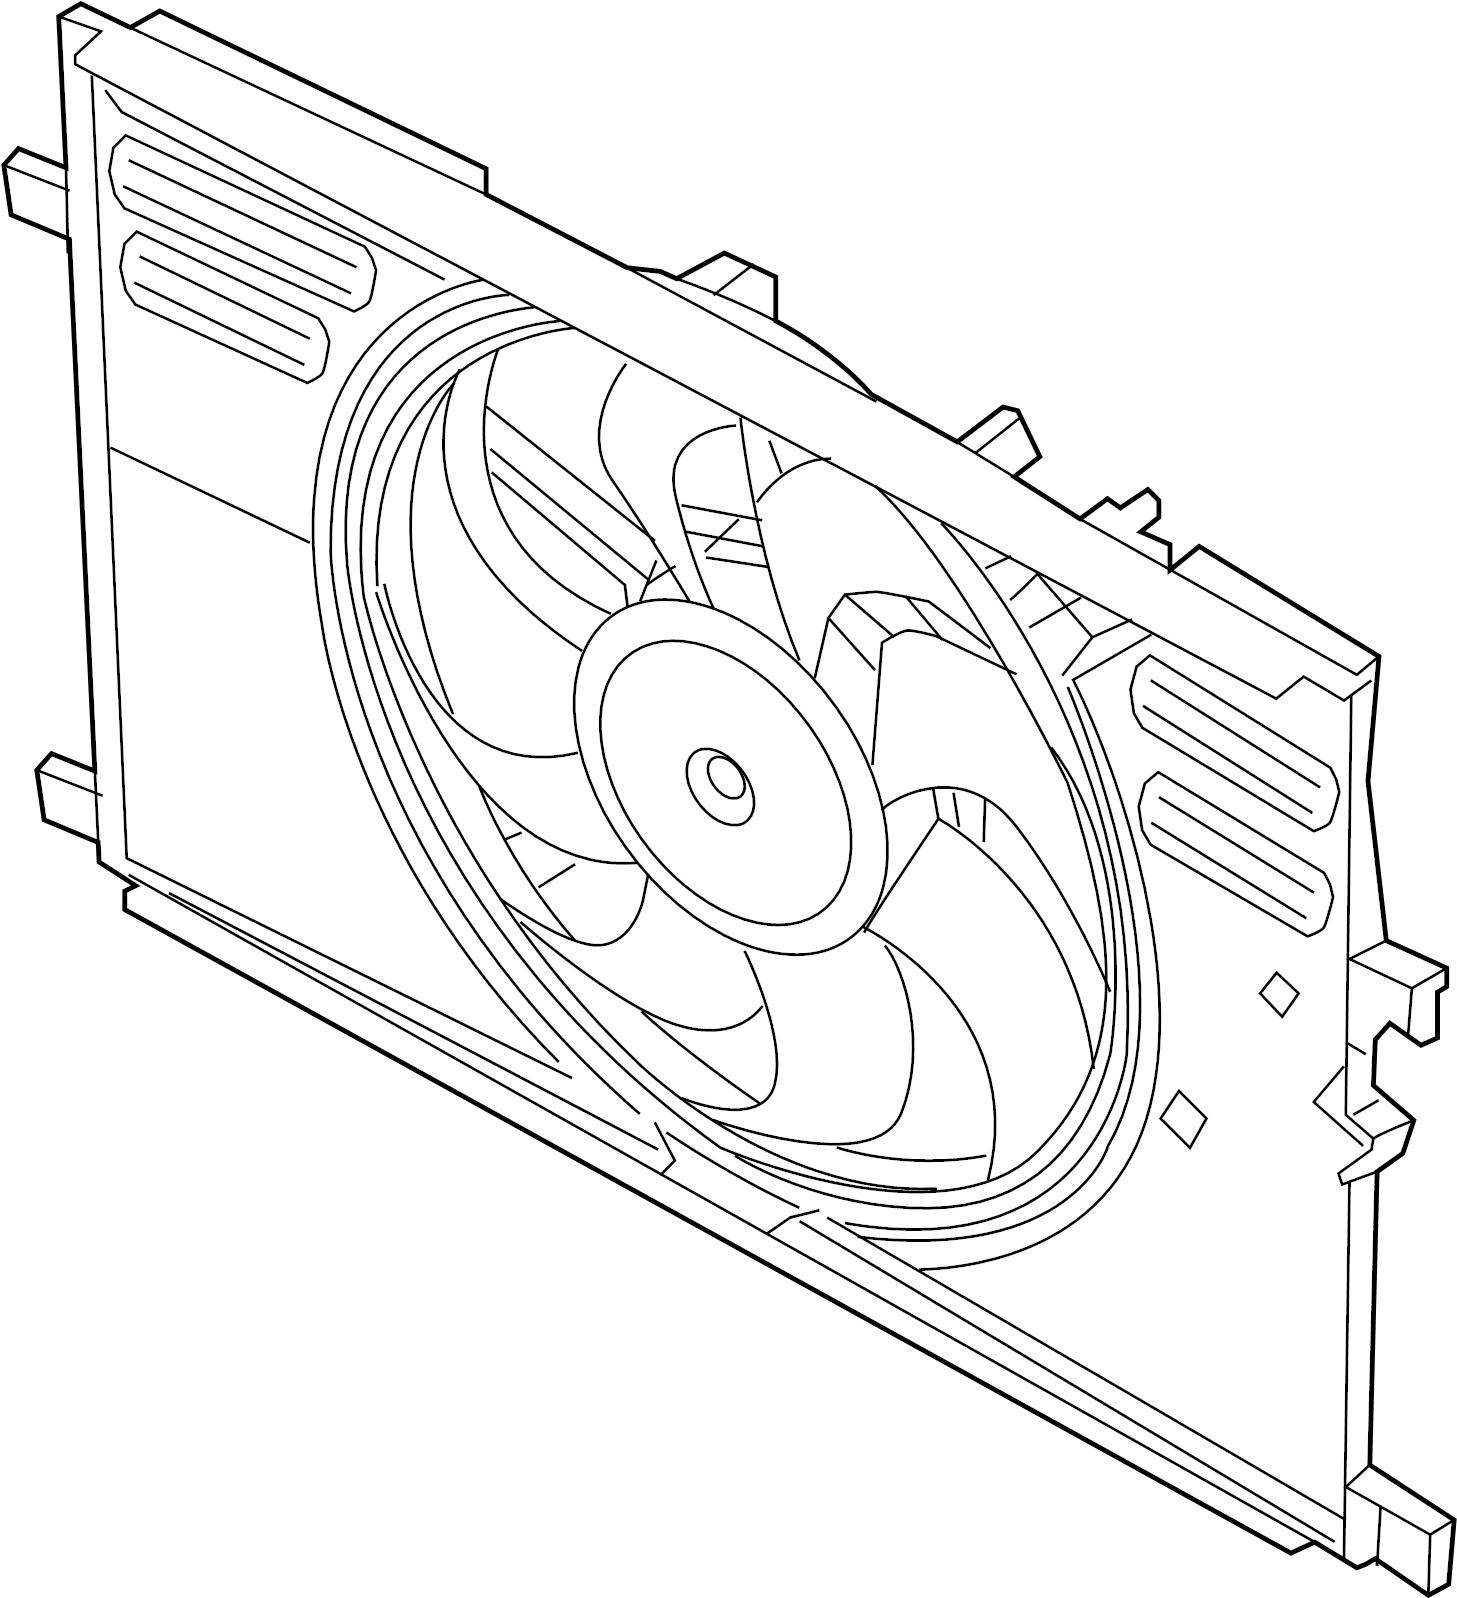 Jaguar F-Pace Engine Cooling Fan Assembly. 2.0 LITER GAS